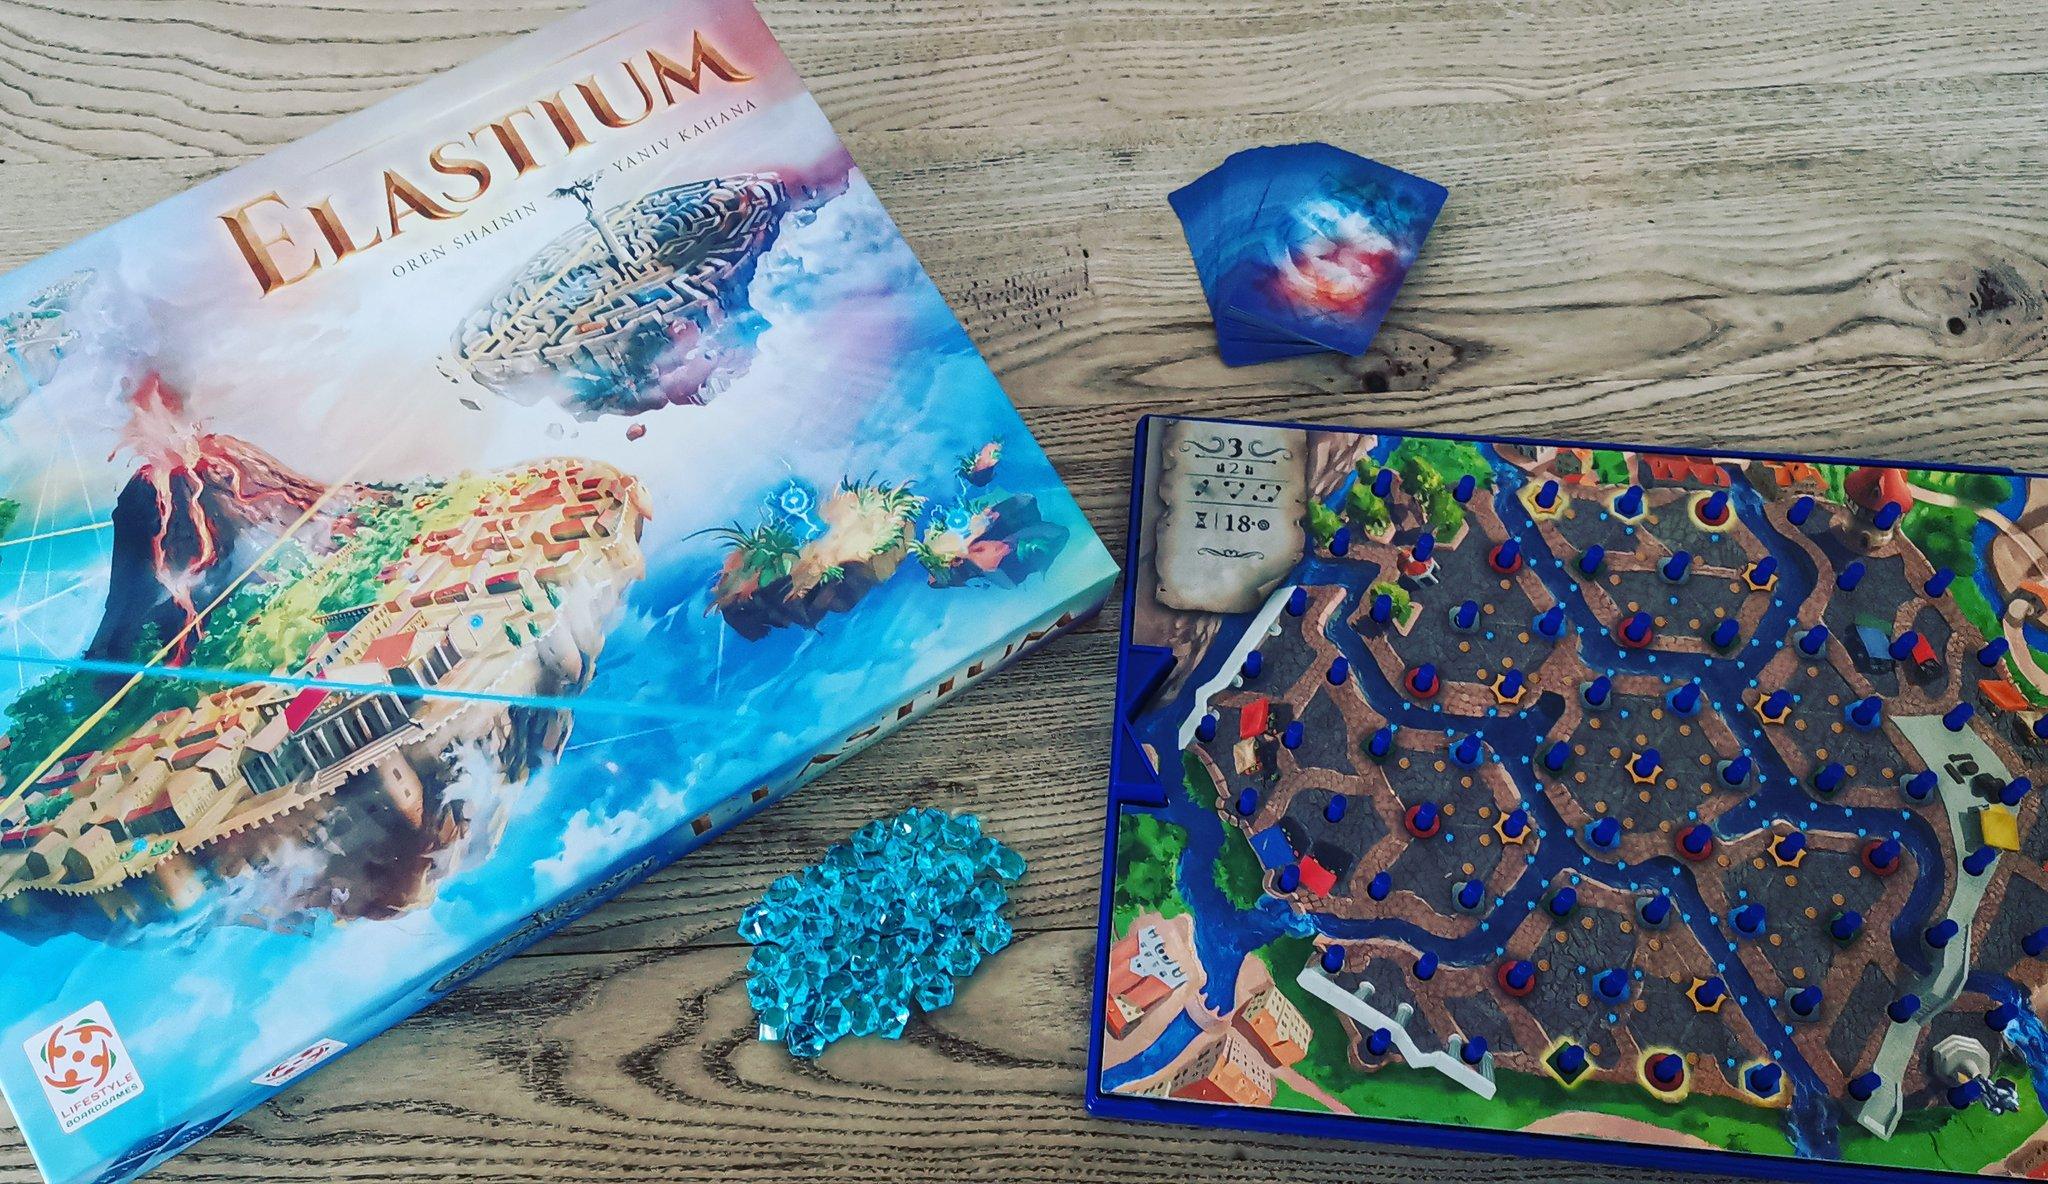 Elastium – Les élastiques, c'est fantastique?